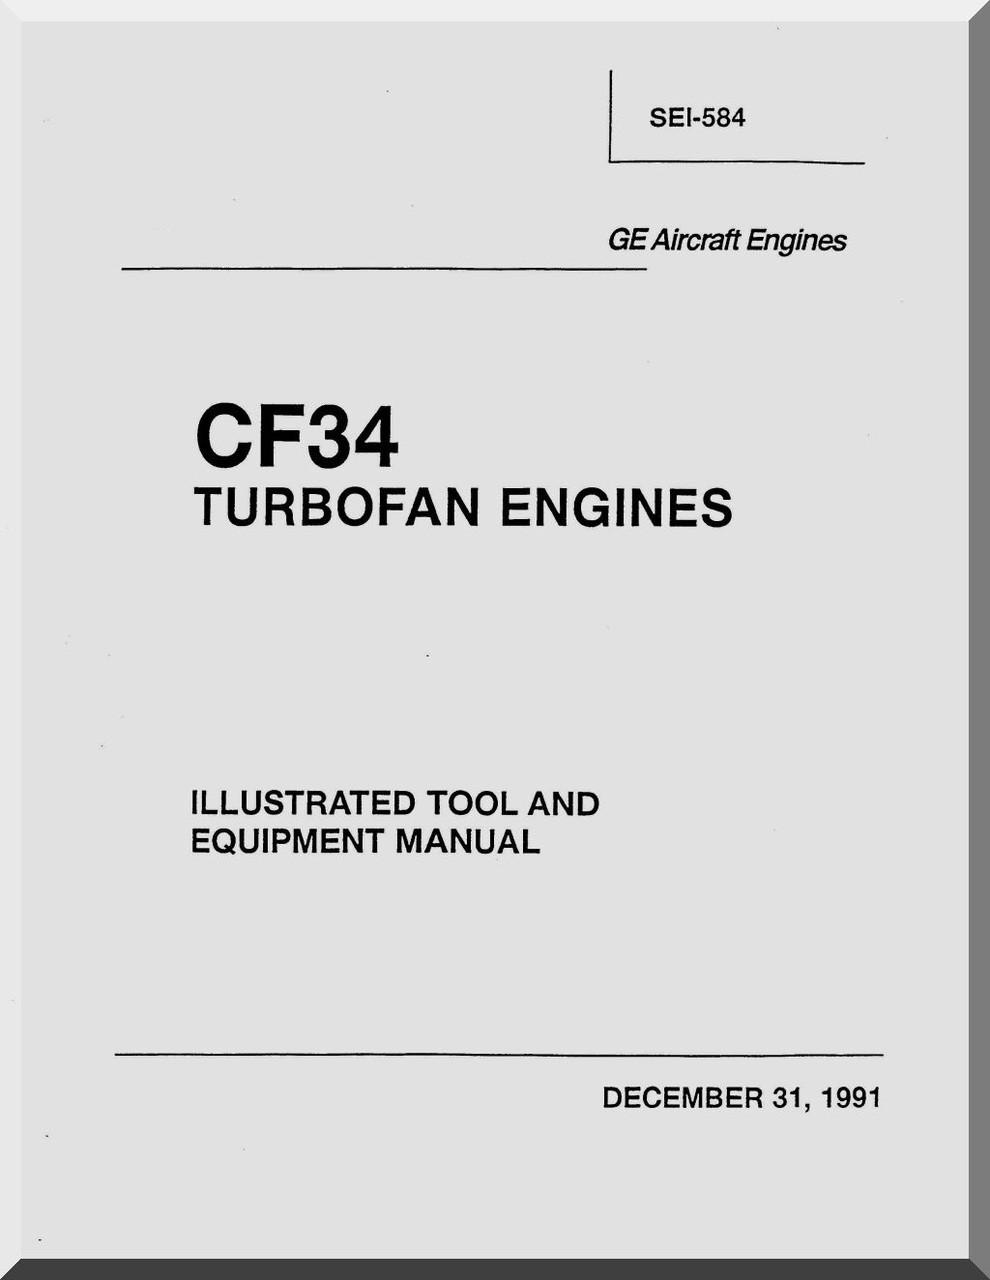 General Electric CF34 Turbofan Engines Illustrated Tool and Equipment  Manual ( English Language ) -SEI-584